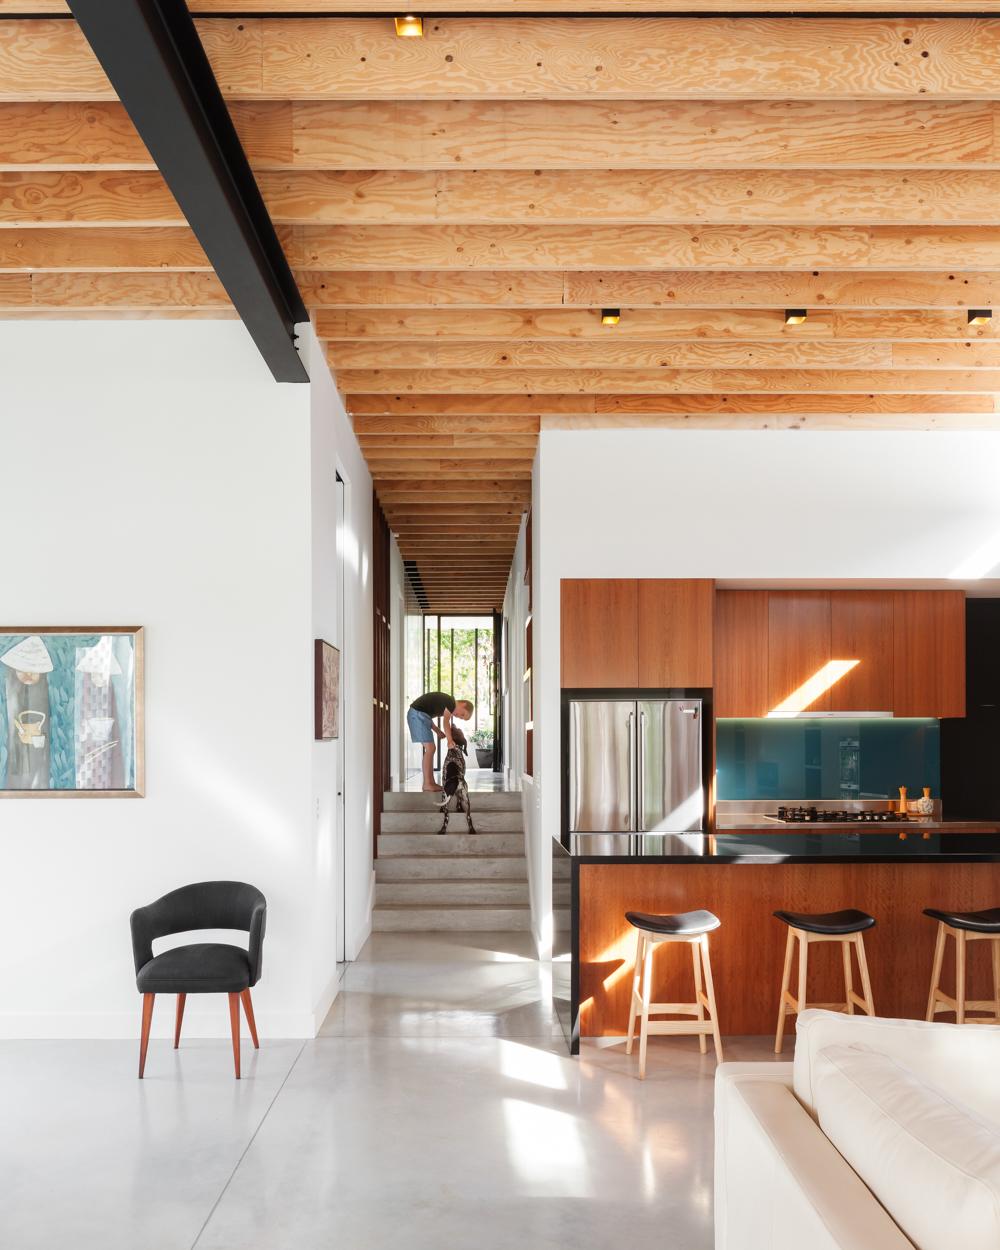 turramurra-house=noxon-giffen-architects-the-design-emotive--9.jpg